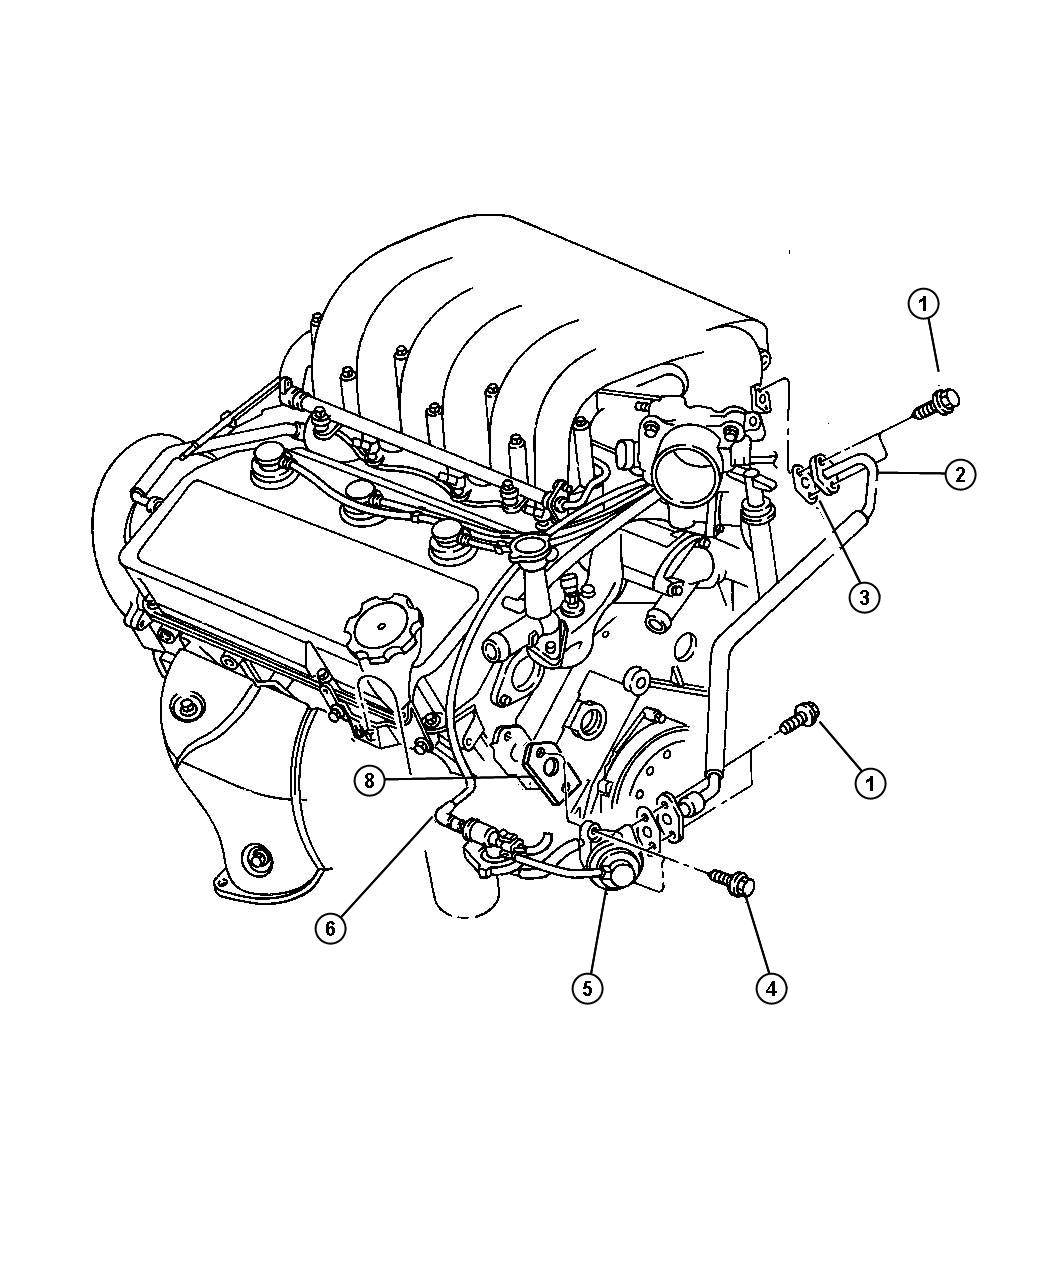 Chrysler Sebring Egr System 2 5l Engine